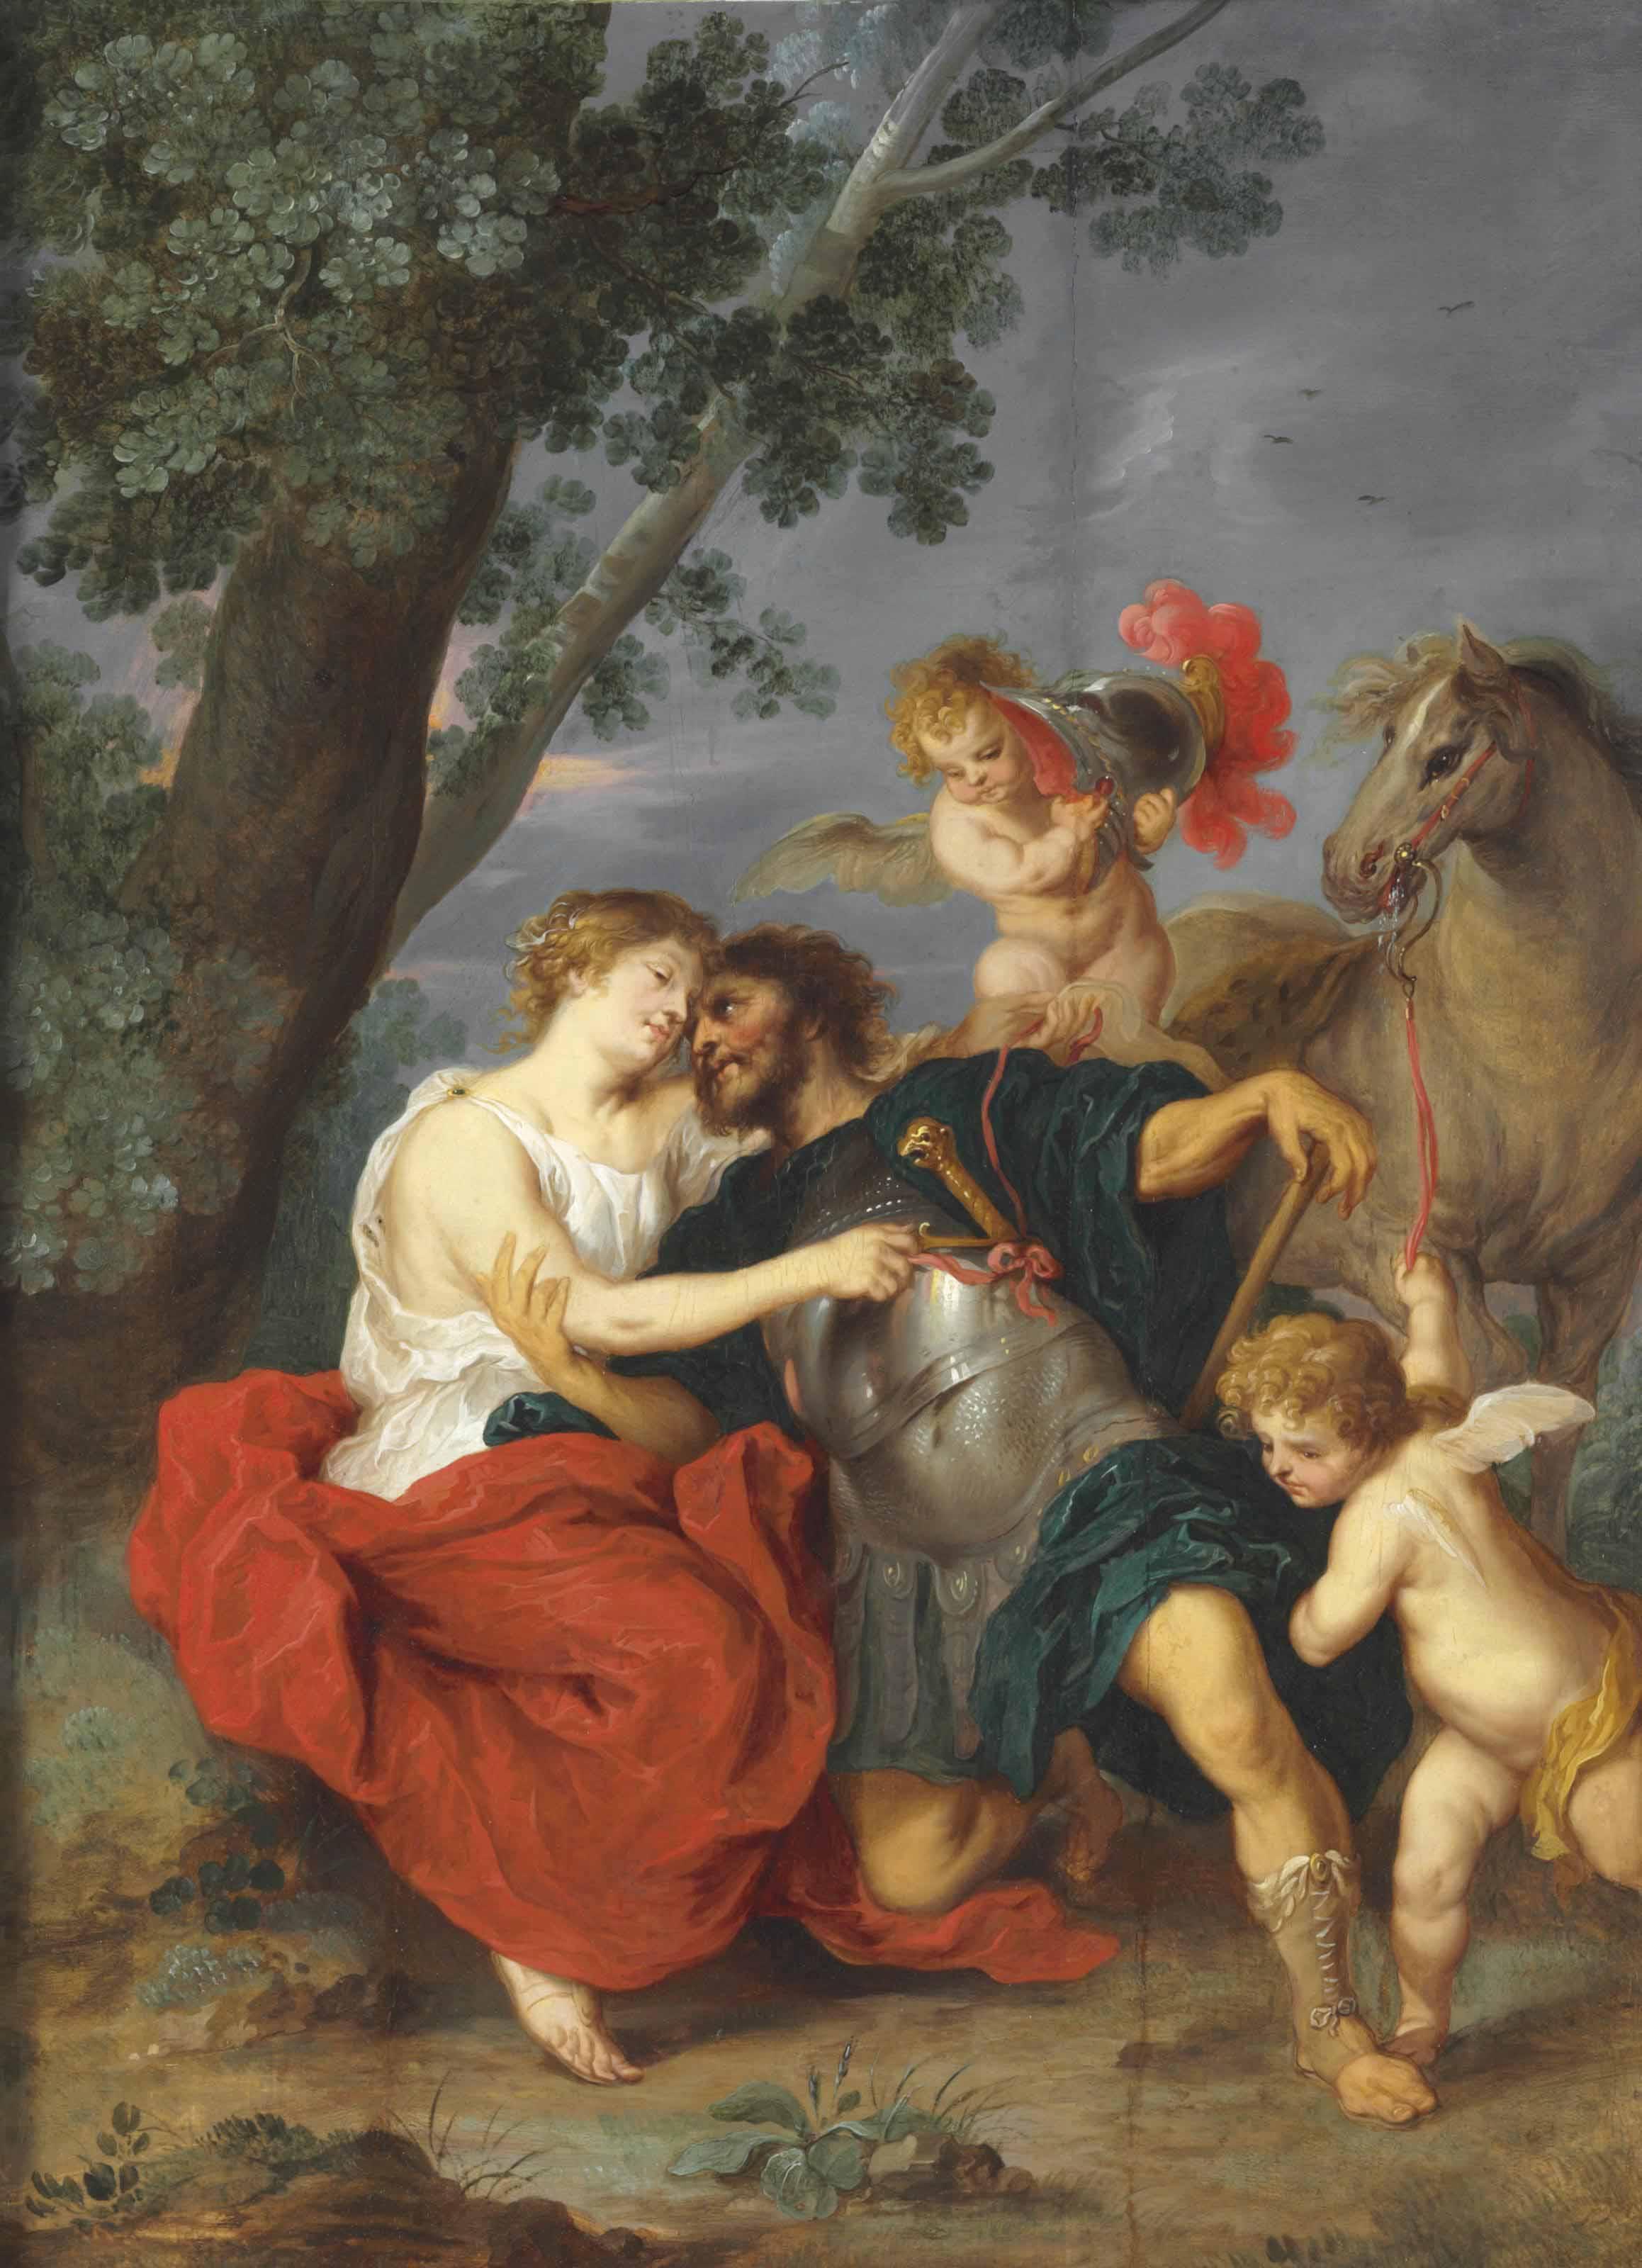 Studio of Peter Paul Rubens (S